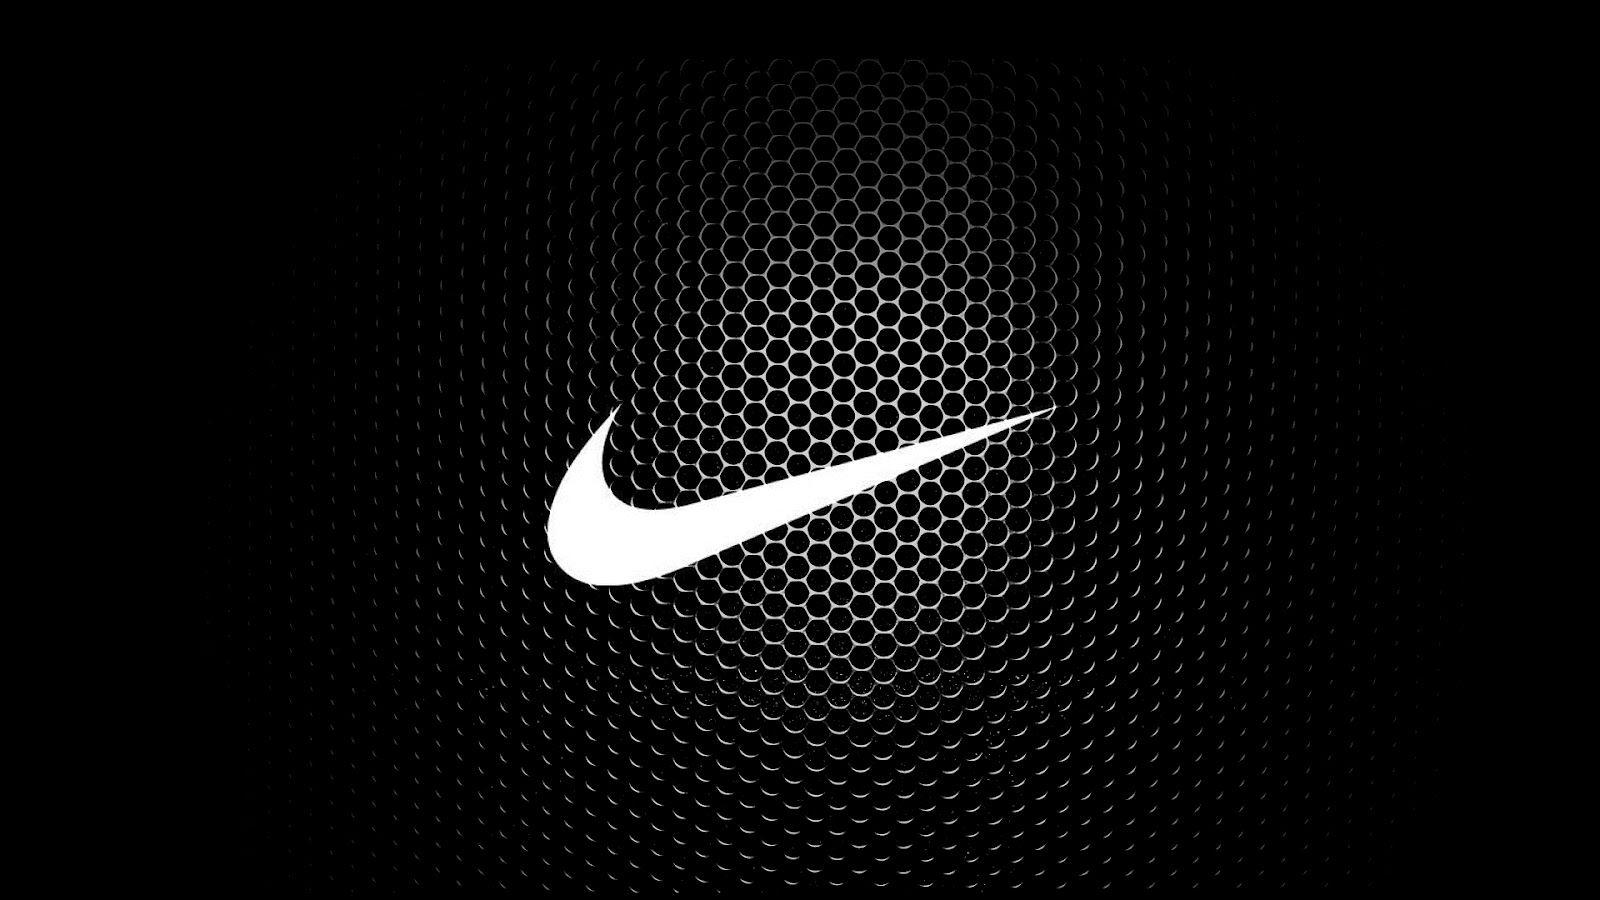 Nike Logo HD 1080p Wallpapers Download Coisas que adoro